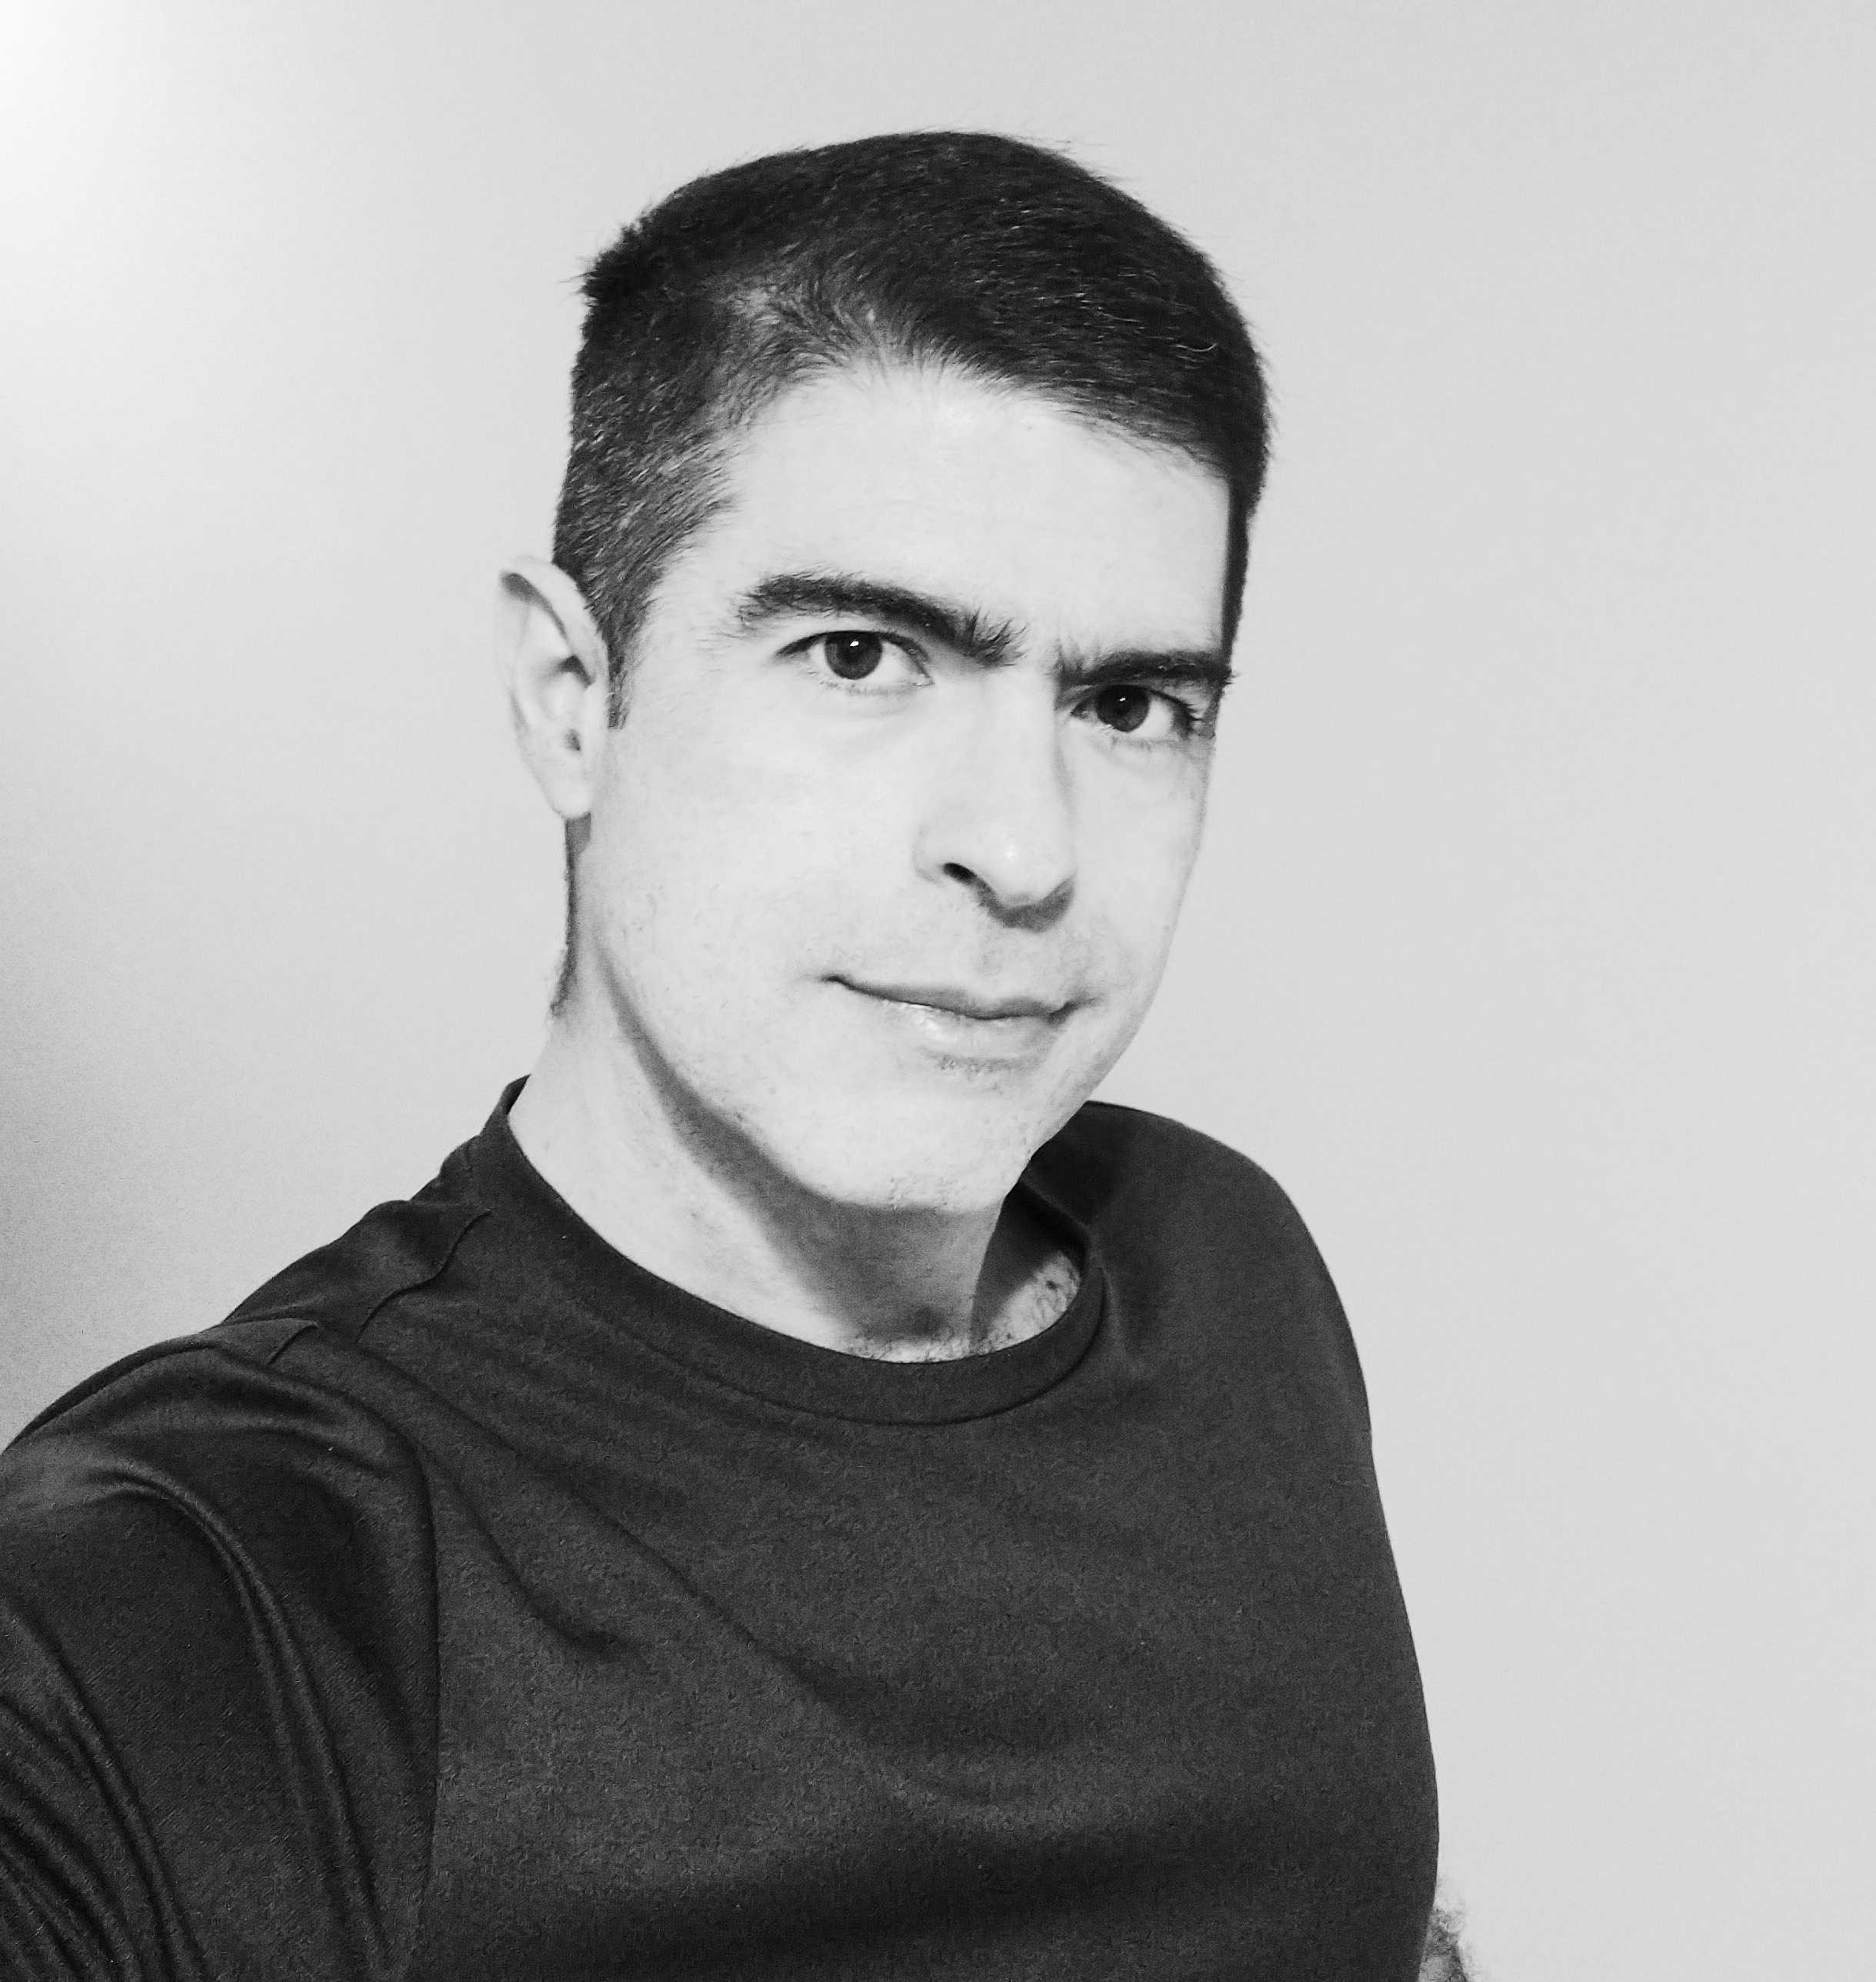 Leandro Galvao